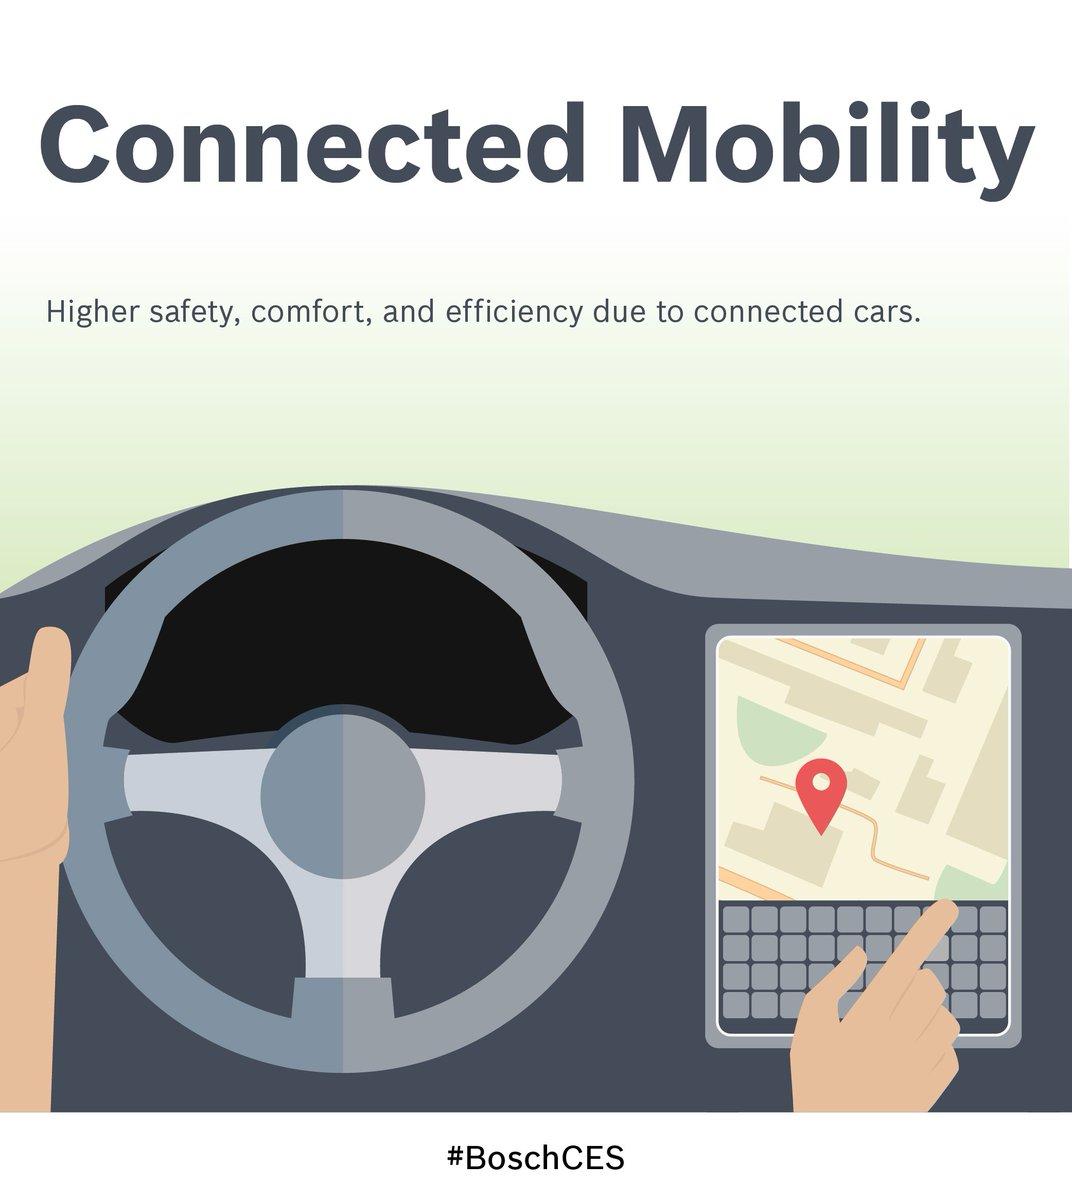 More on #automateddriving, parking & #connectedmobility at booth #2302 #CES2016 #BoschCES https://t.co/fpHErX07JZ